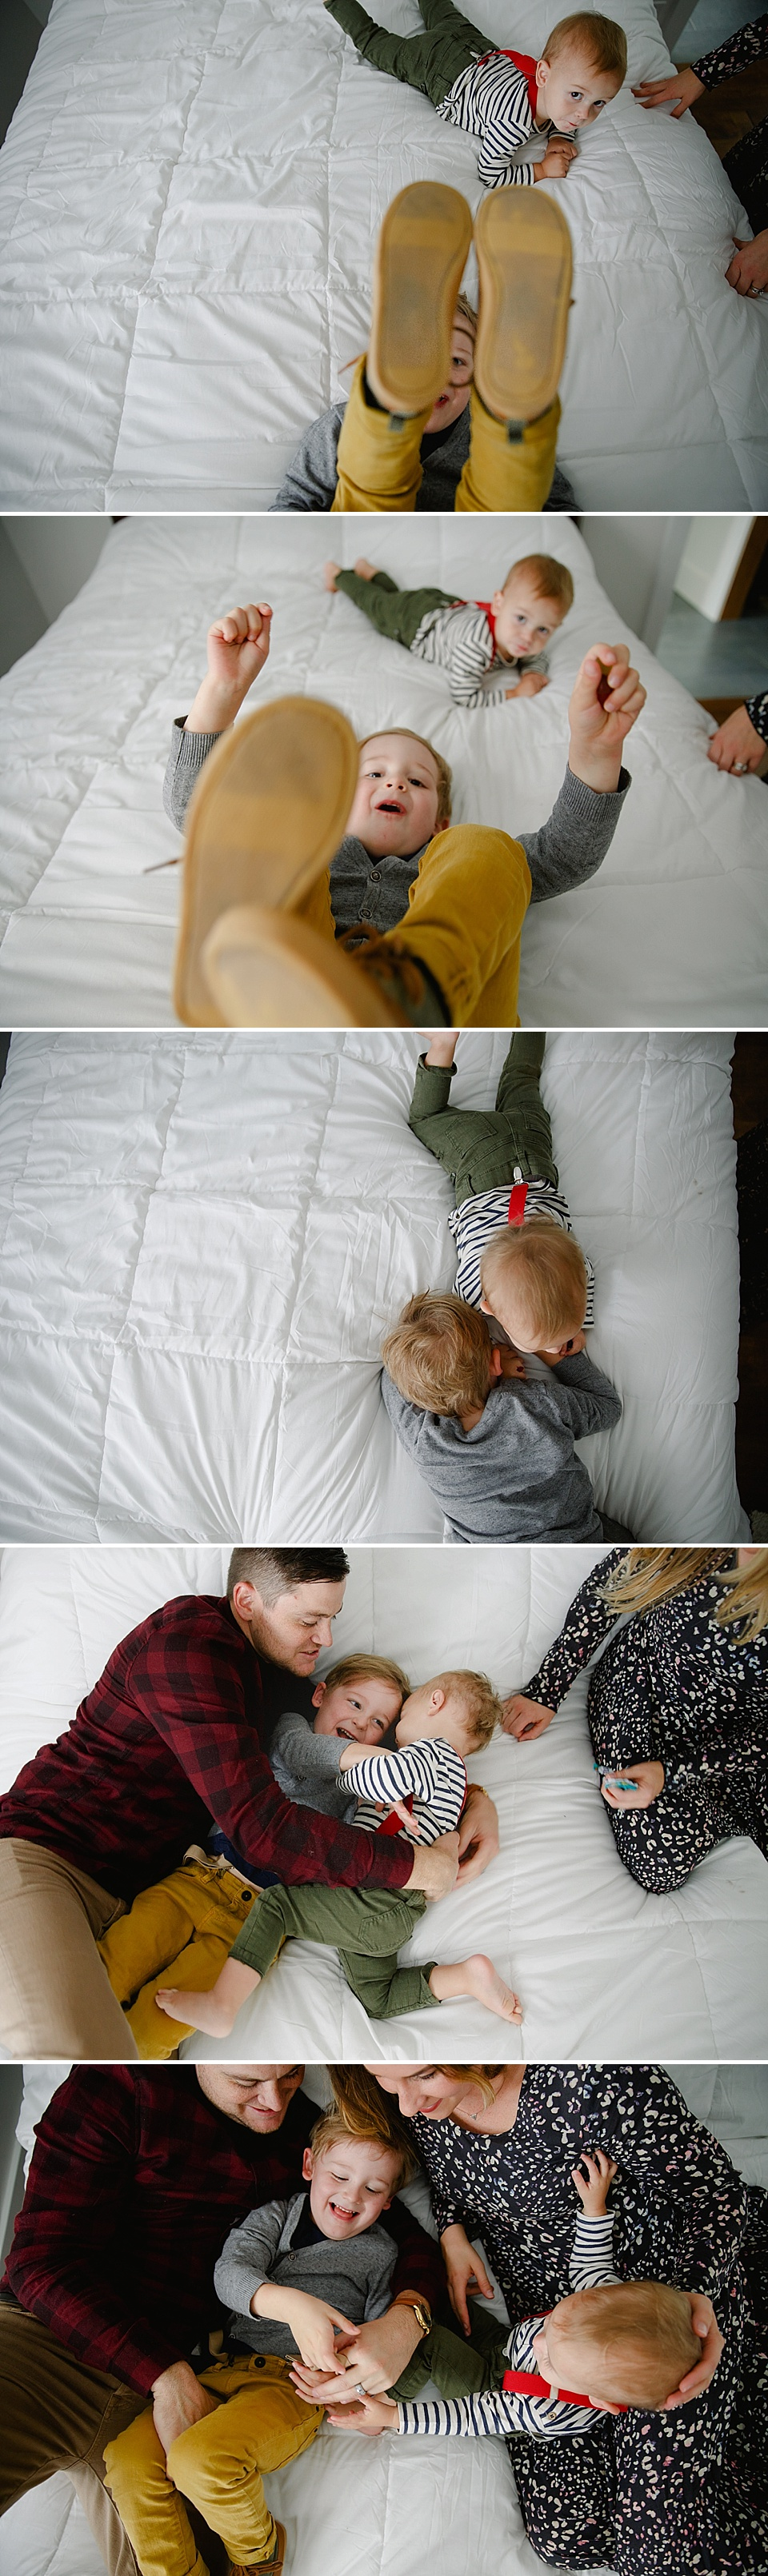 © Summer Murdock   Photographer Salt Lake City Area Family Photographer